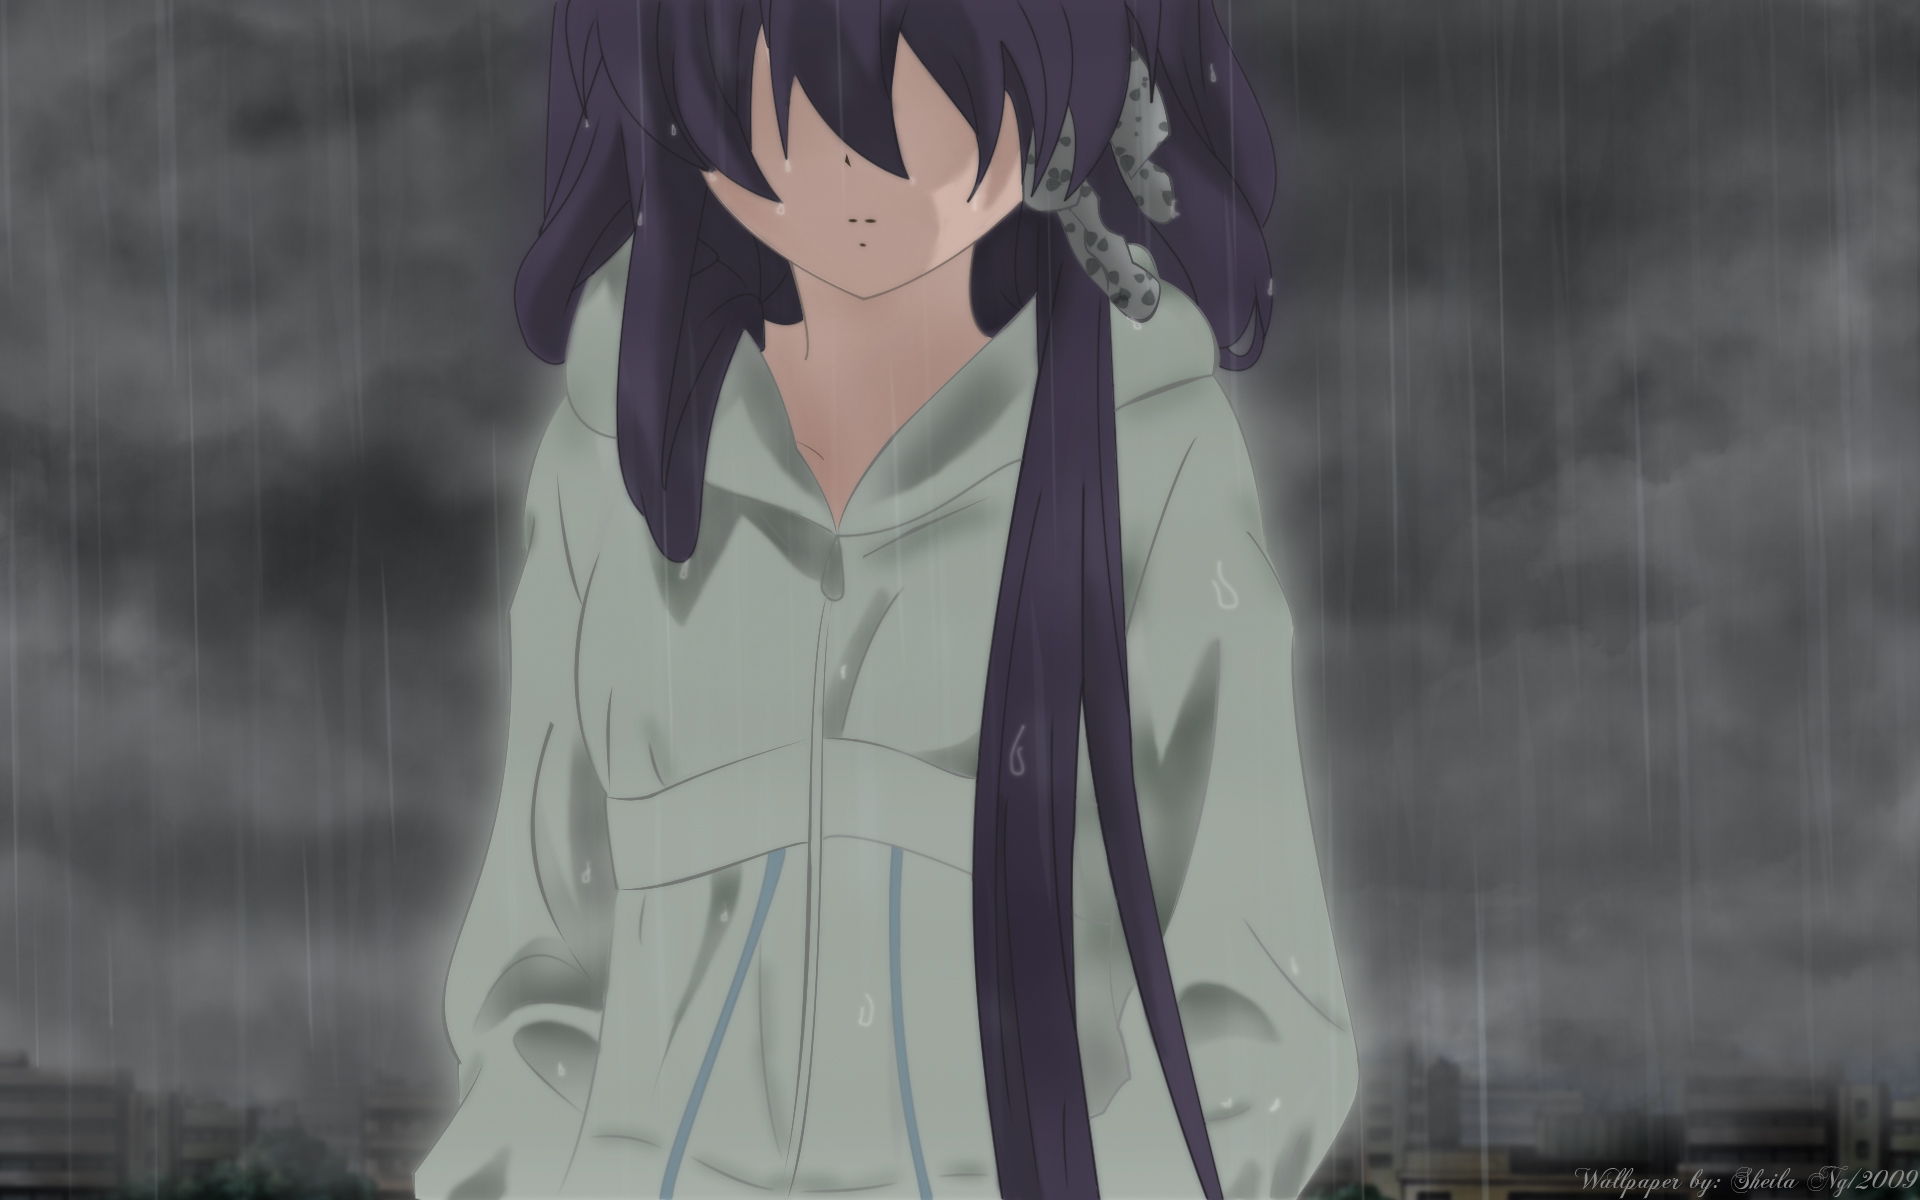 Fujibayashi Kyou Clannad Zerochan Anime Image Board